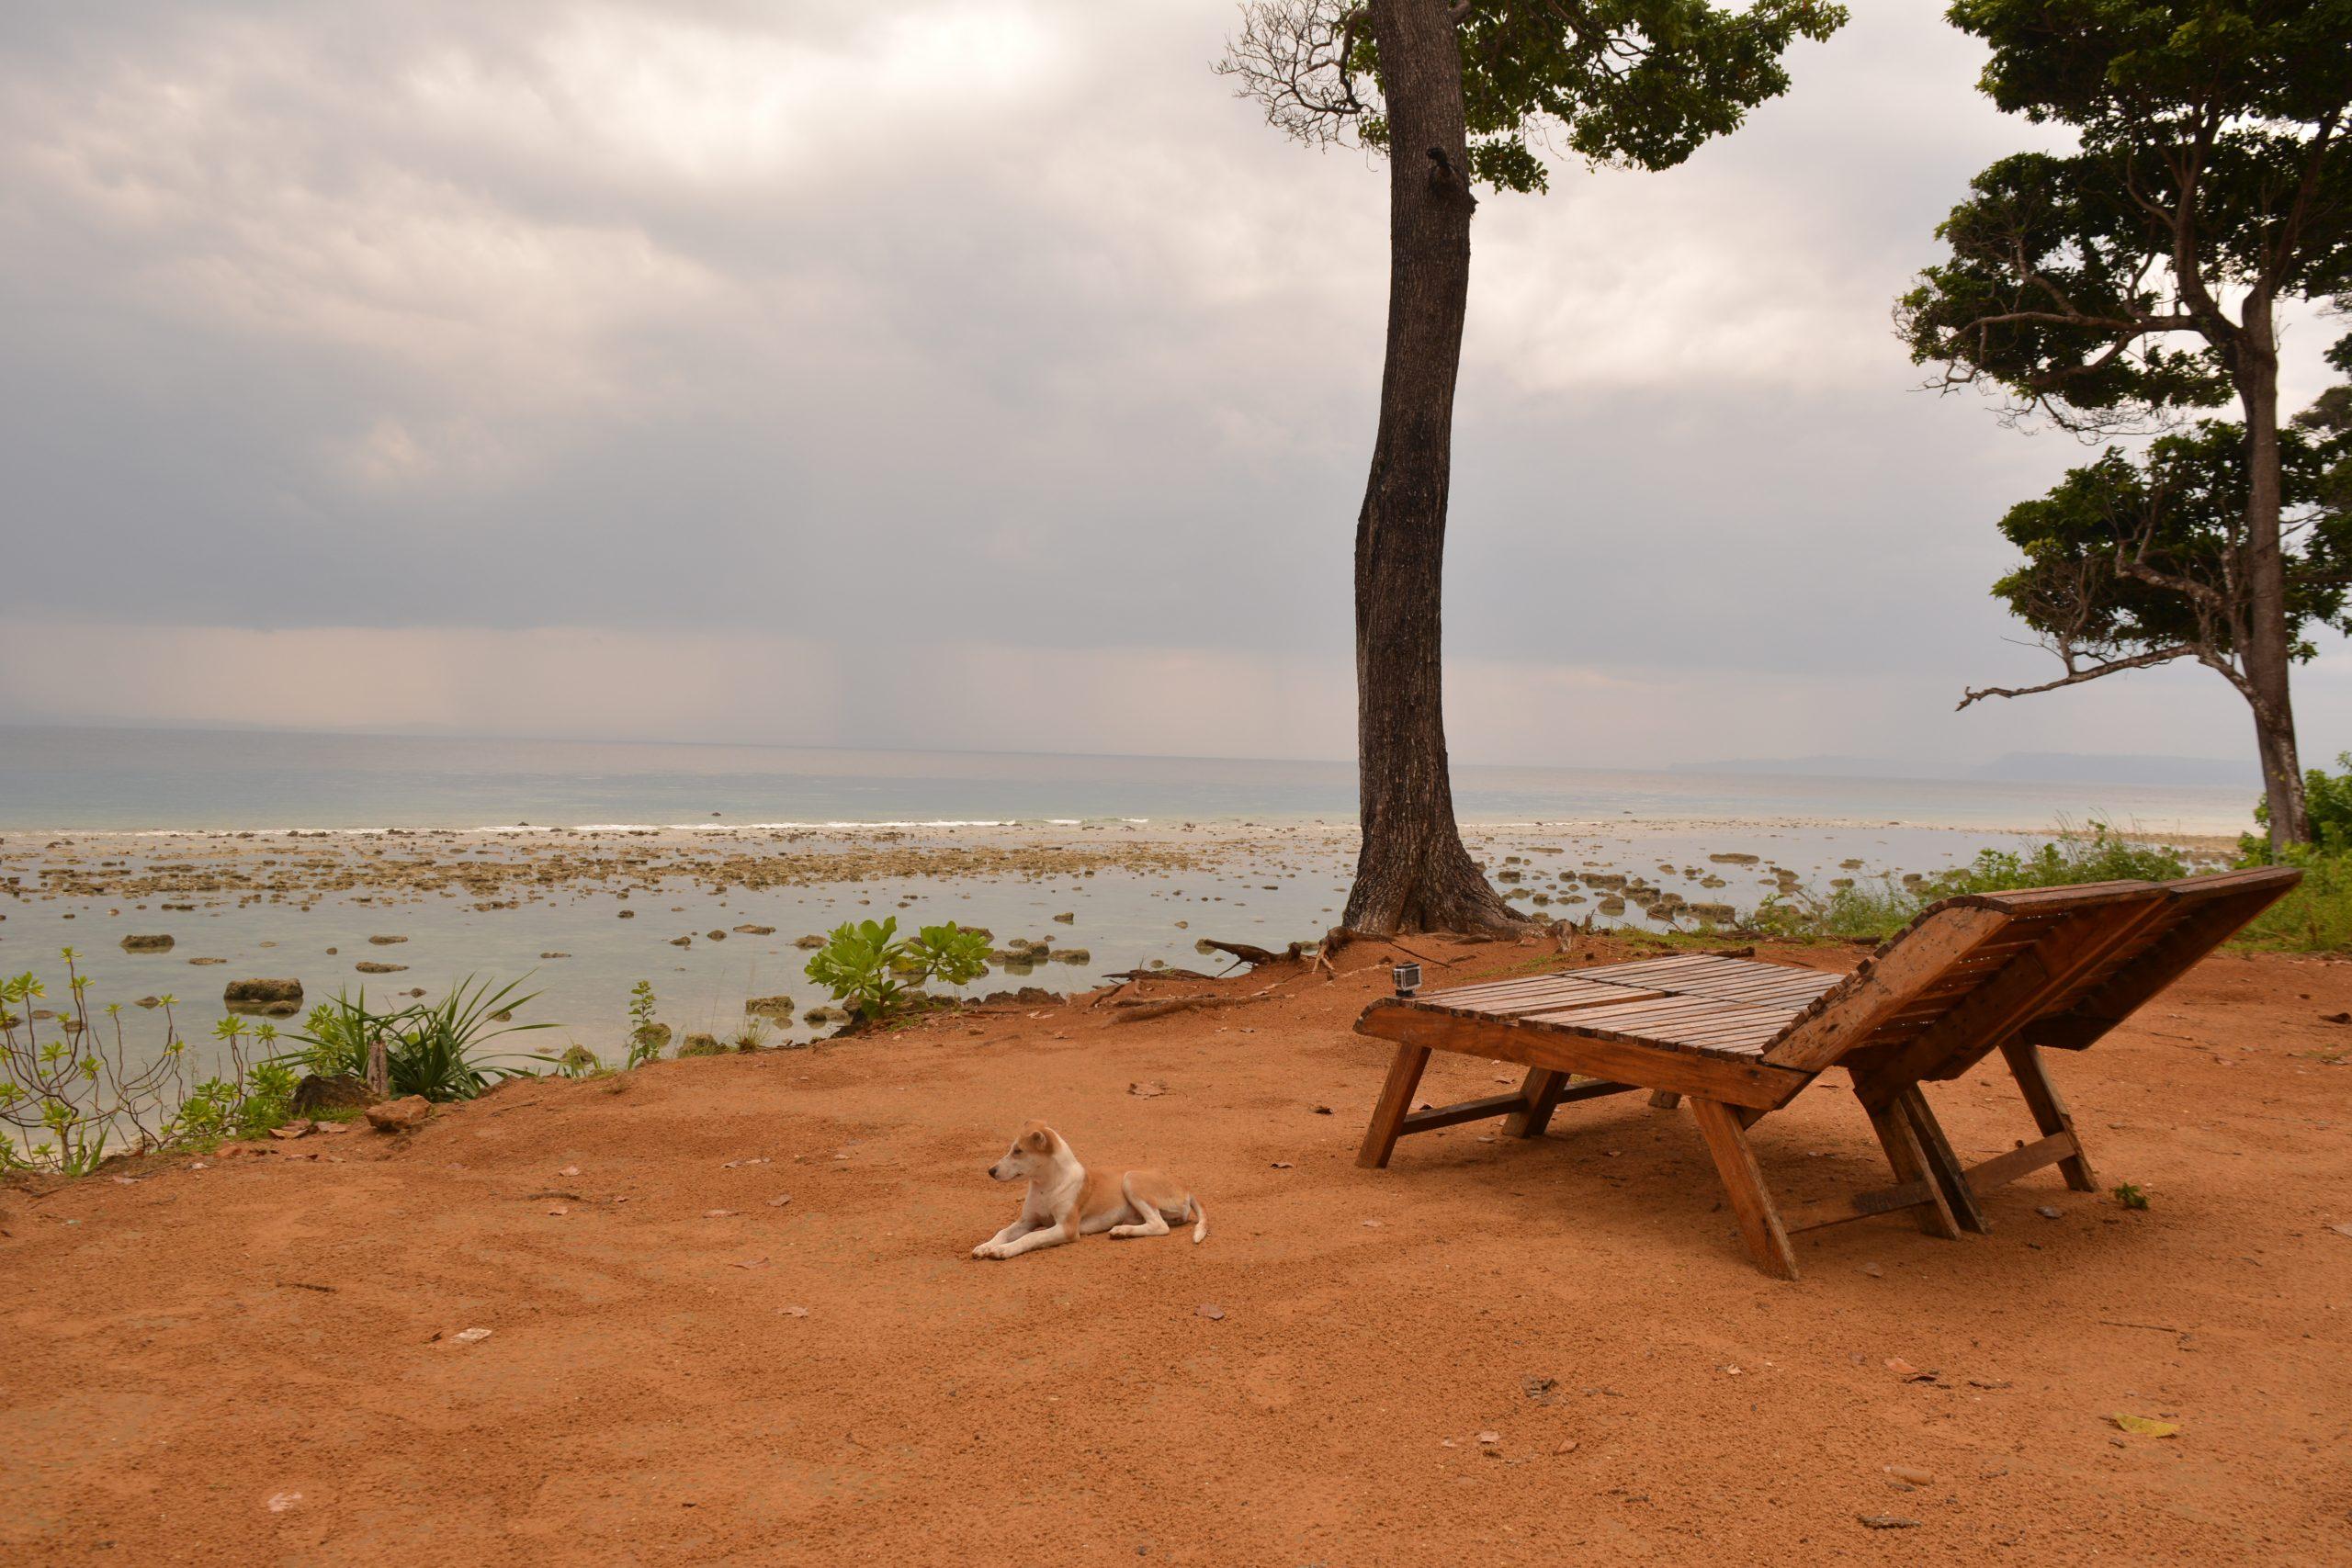 Beach during rainy season